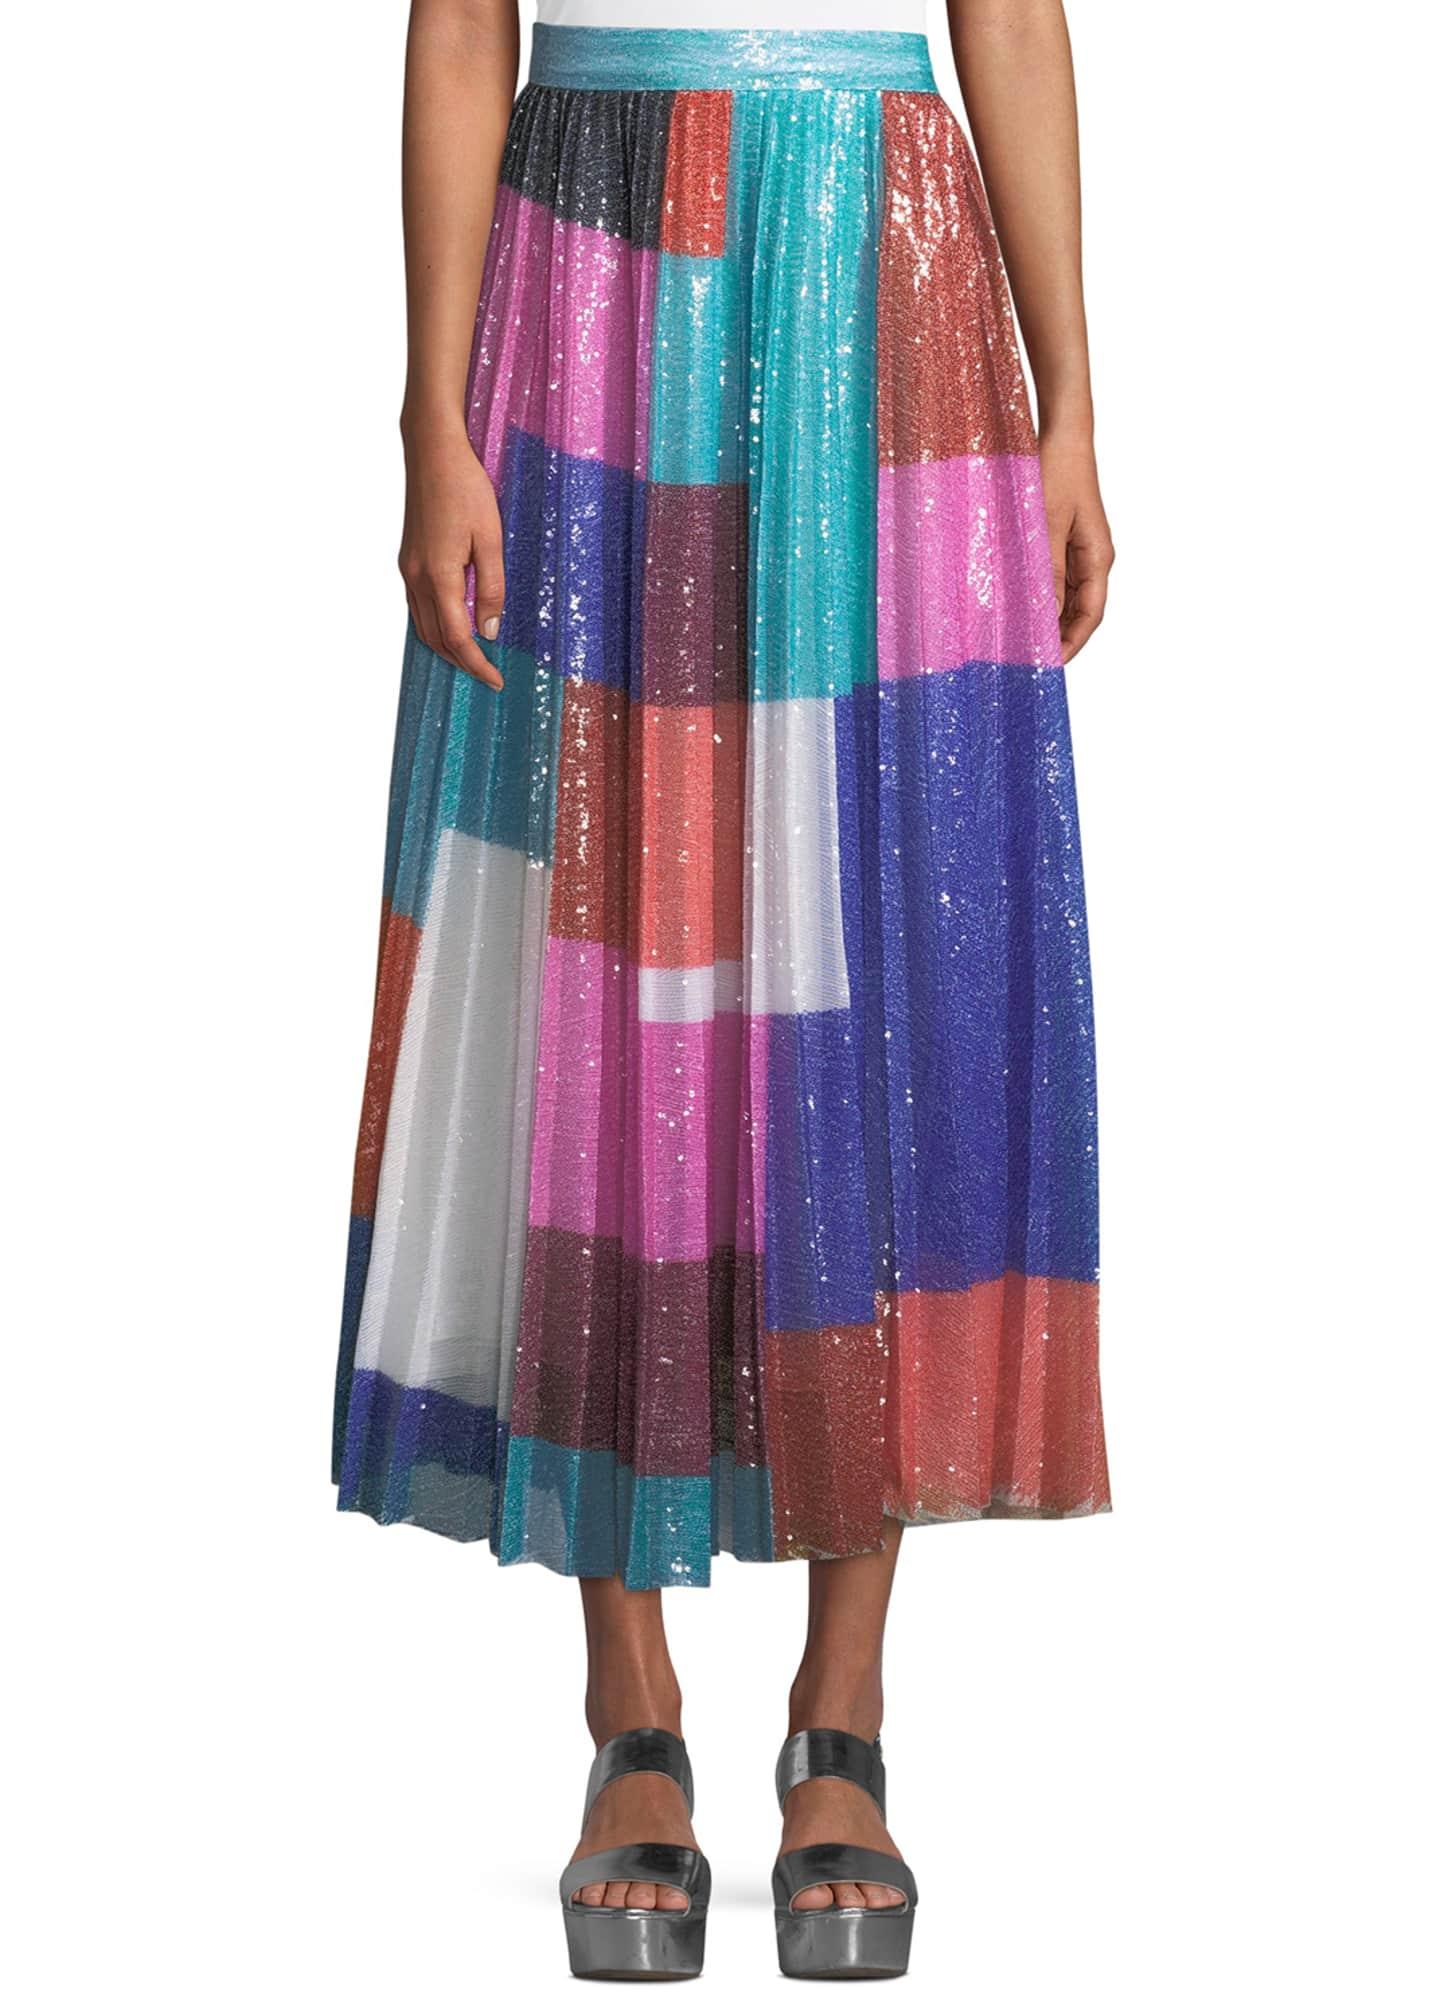 Mary Katrantzou High-Waist Colorblocked Sequin Pleated Midi Skirt